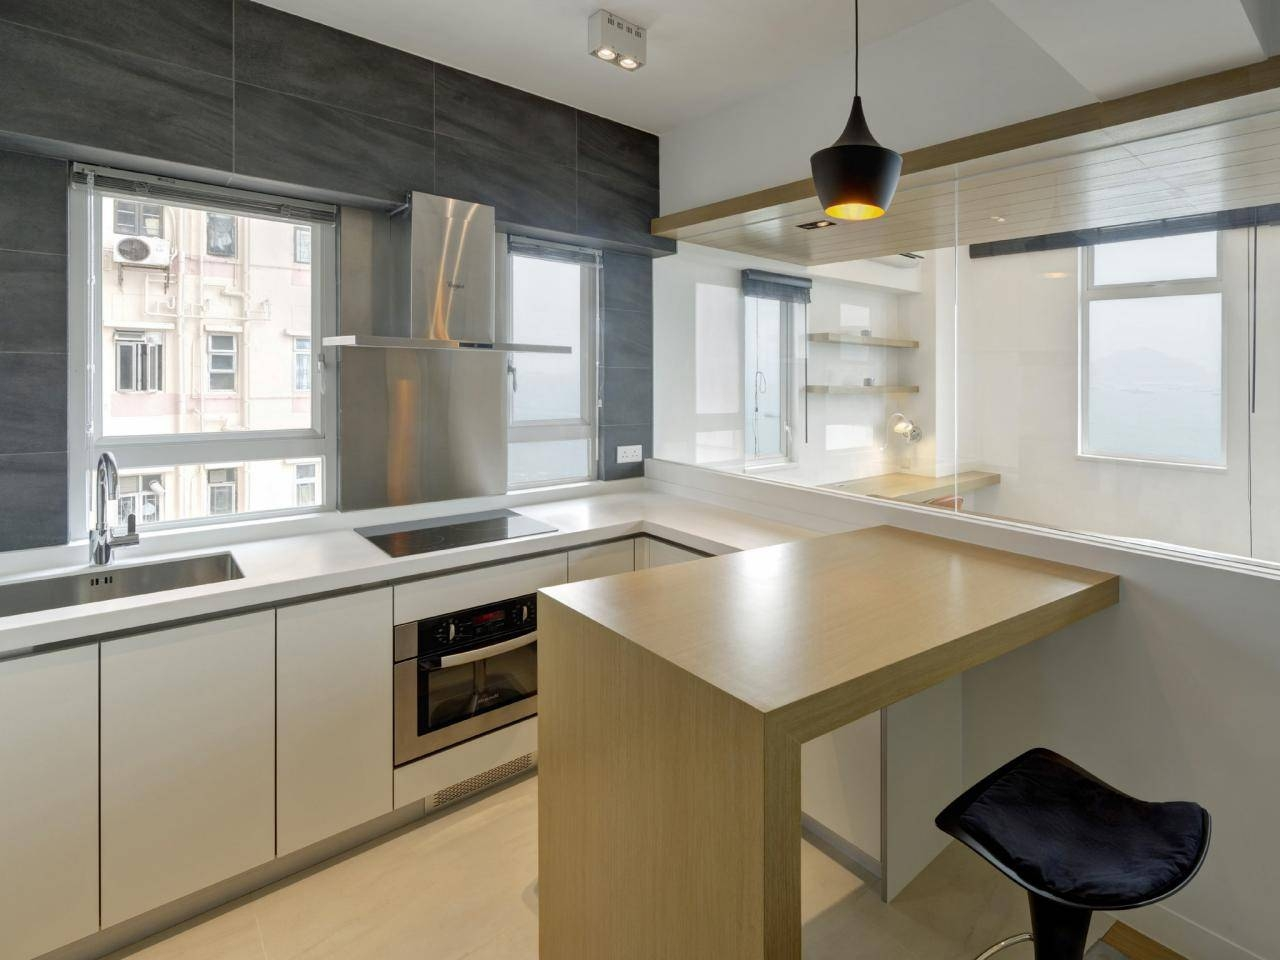 28+ [ Kitchen Seating Ideas ] | Kitchen Corner Seating 50 Charming regarding Corner Seating Ideas (Image 2 of 30)